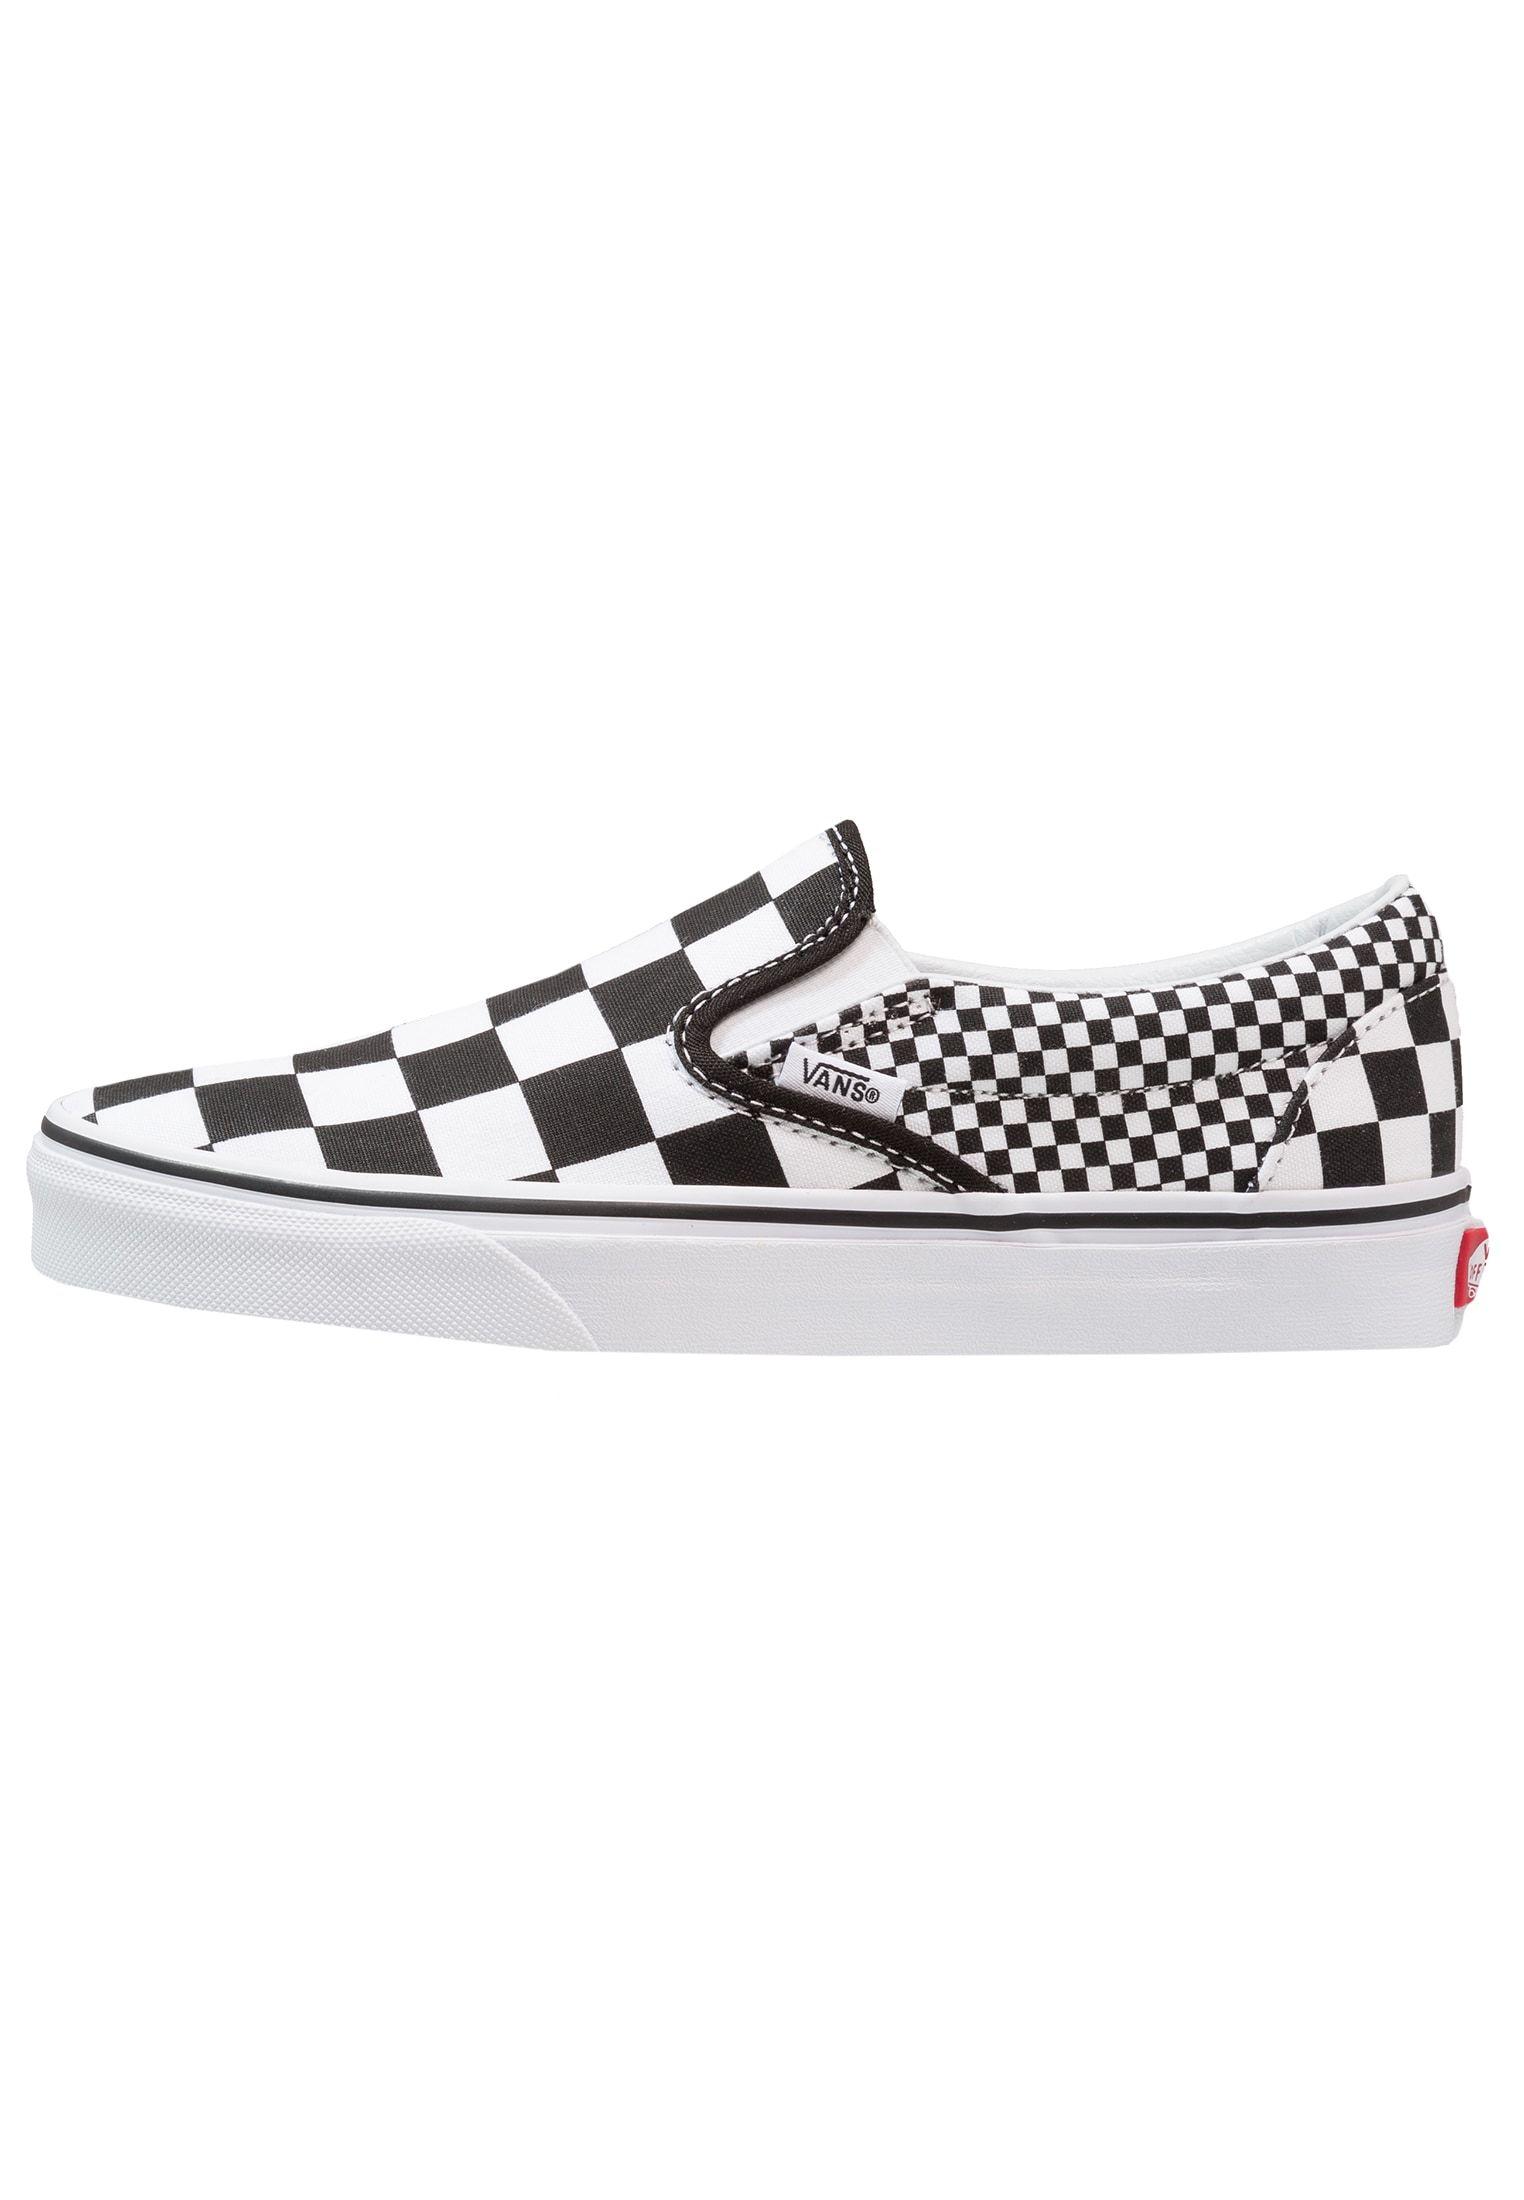 7ed2475620a7 UA CLASSIC SLIP-ON - Loafers - black white   Zalando.dk 🛒